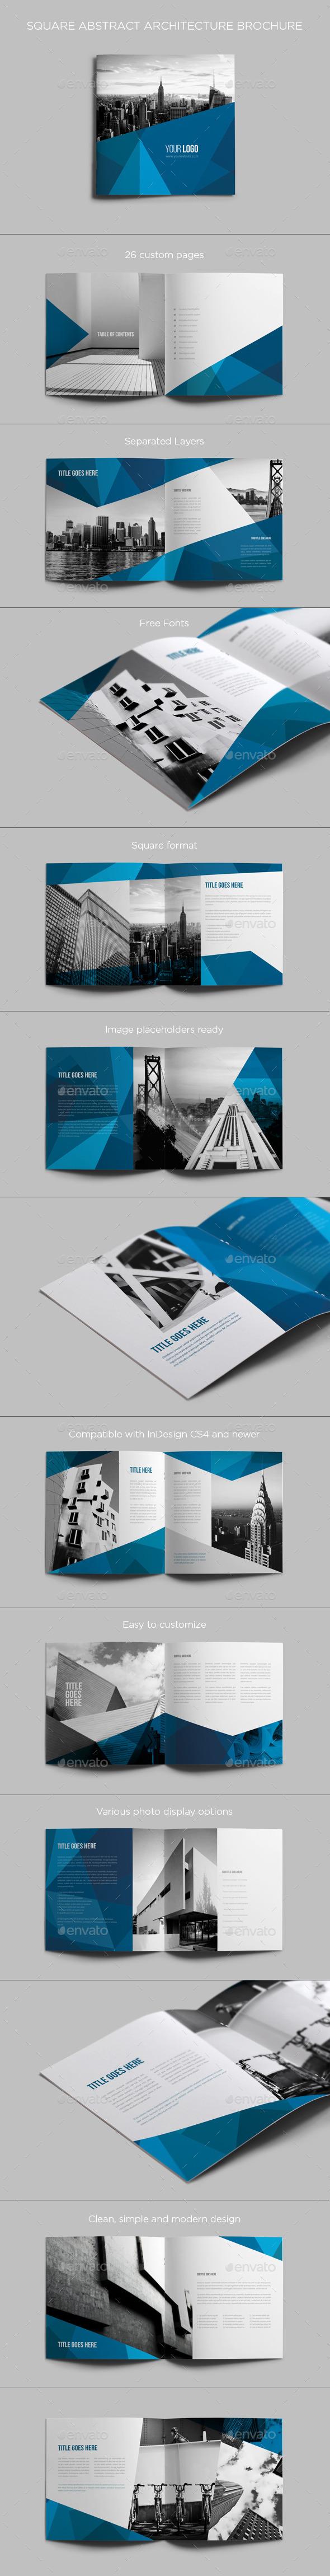 GraphicRiver Square Abstract Architecture Brochure 9204539